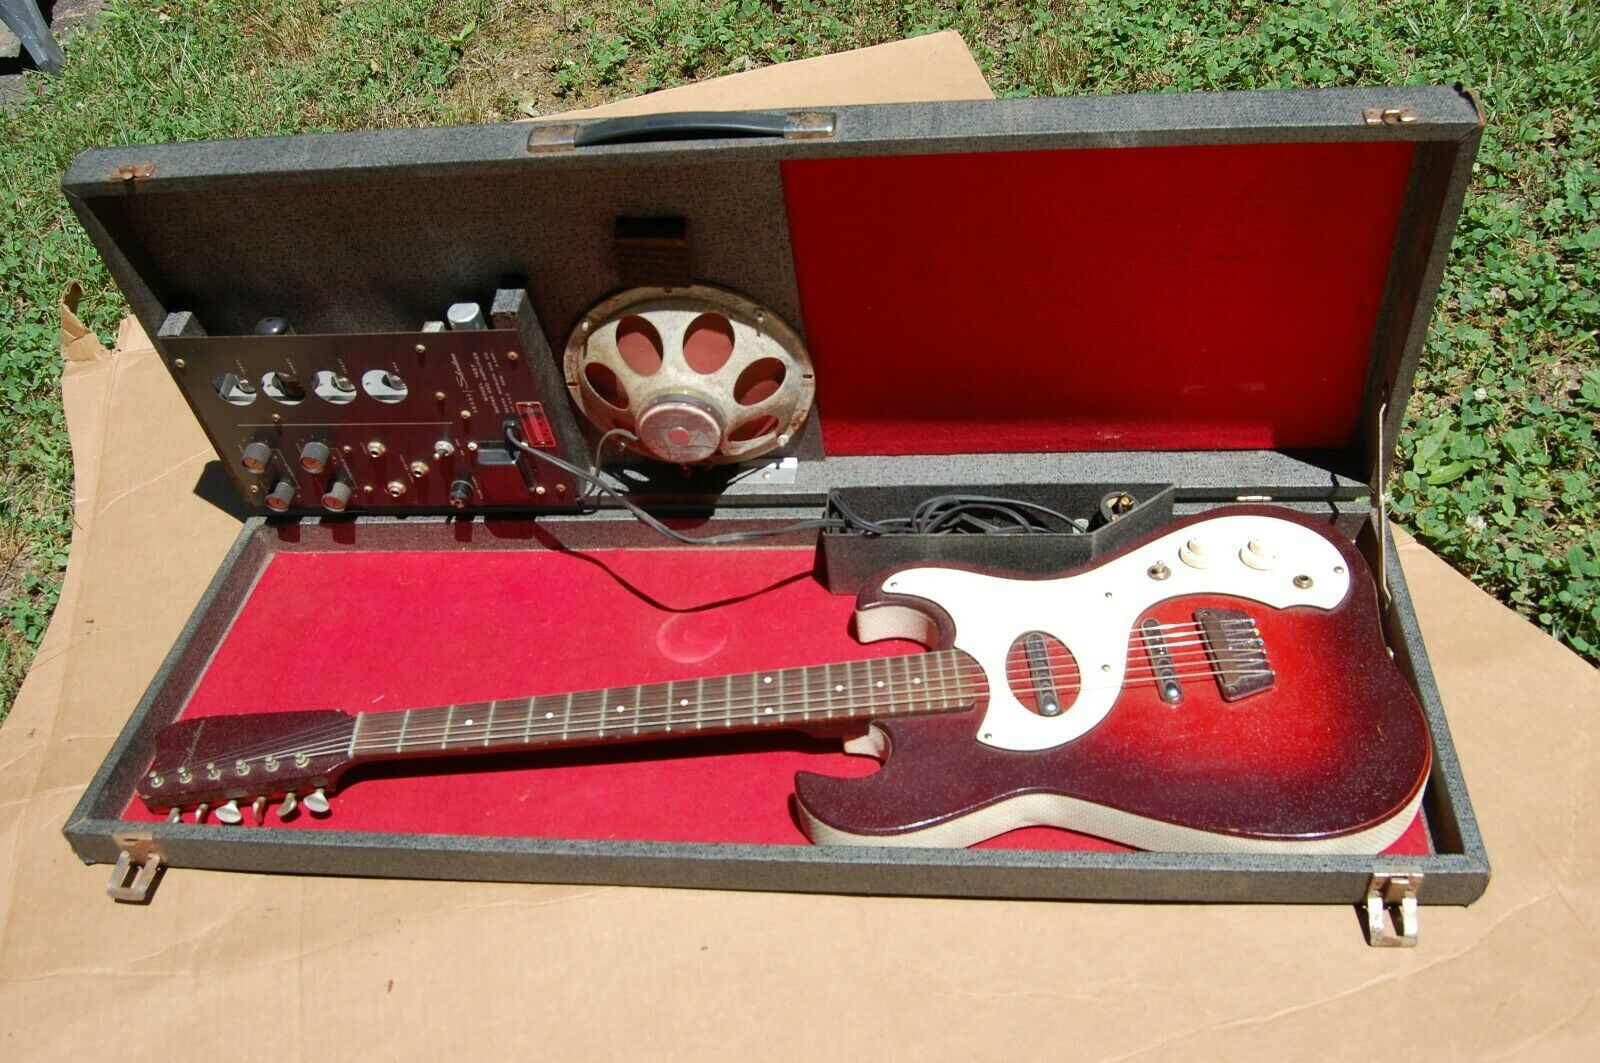 Vintage 1457 SilberTONE GUITAR w TUBE AMP in CASE DANELECTRO '63